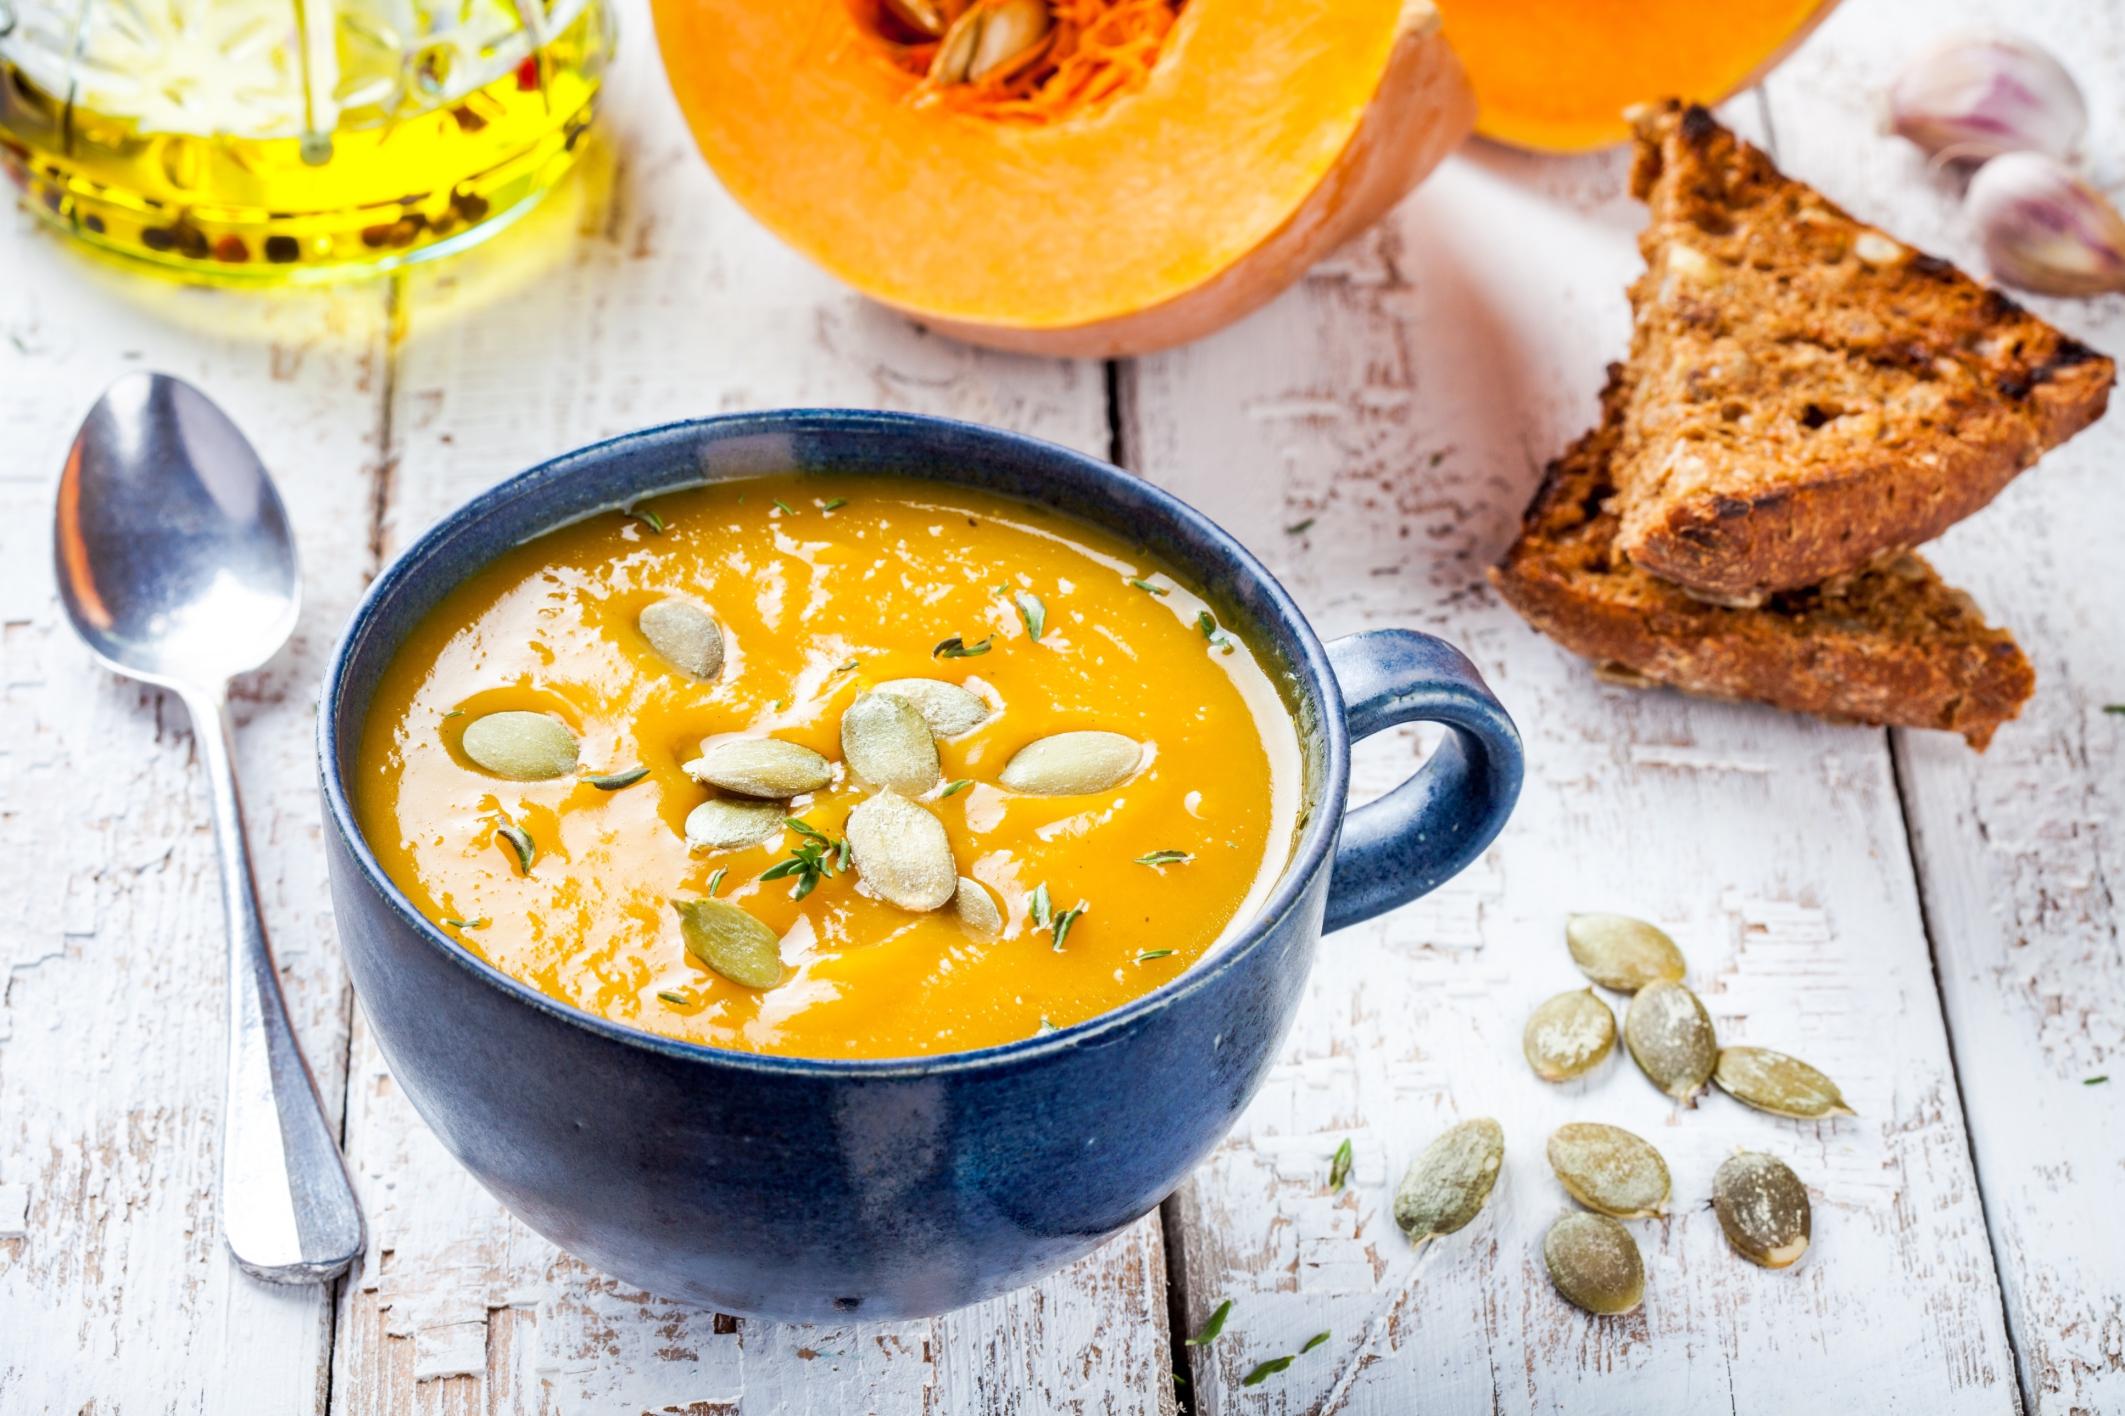 homemade pumpkin cream soup with seeds